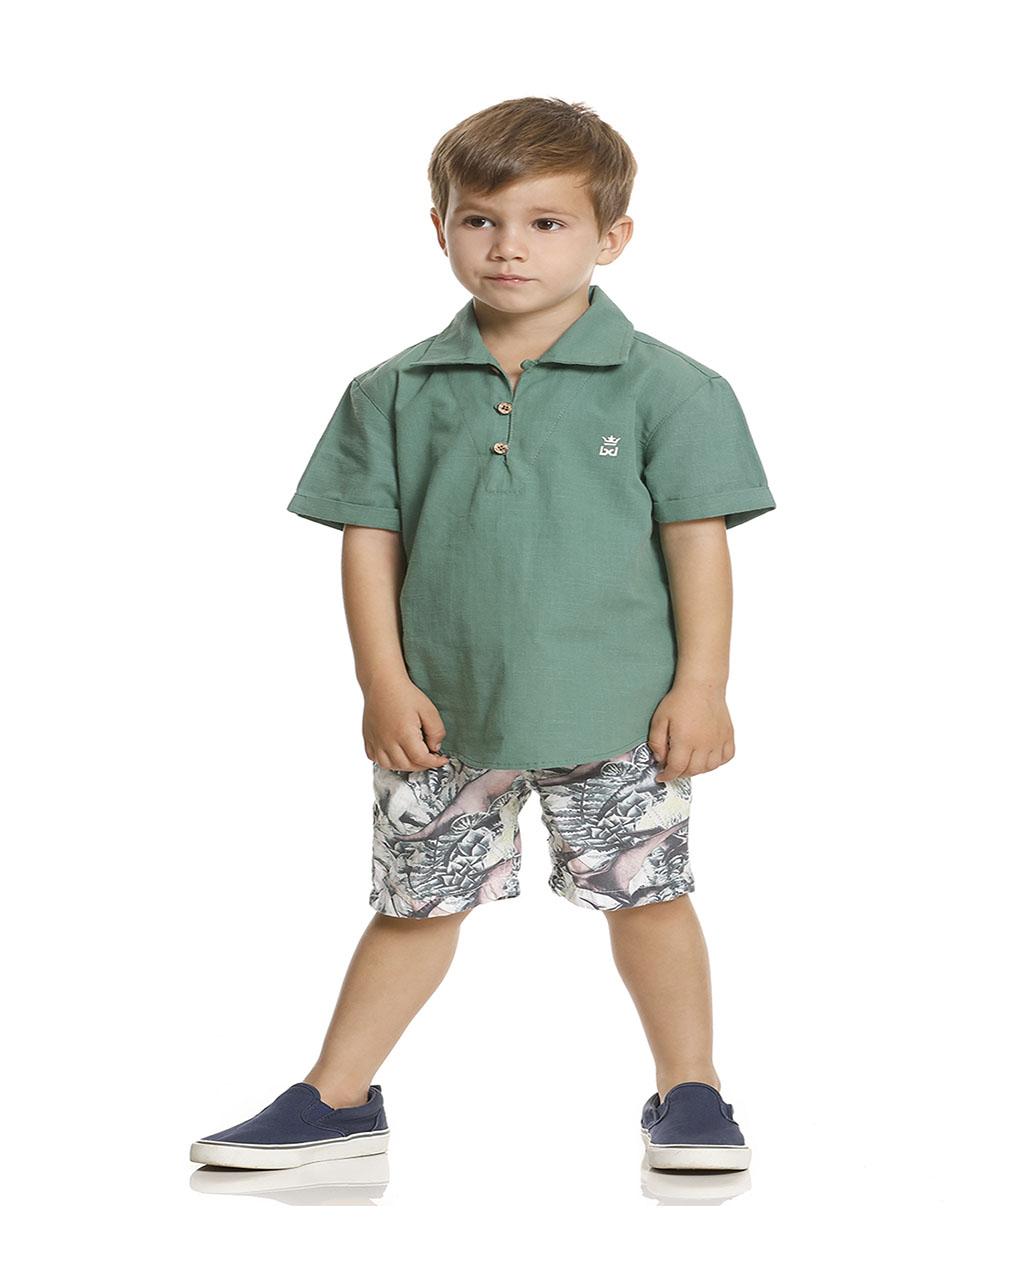 Conjunto Infantil Masculino Camisa com Gola Verde Banana Danger